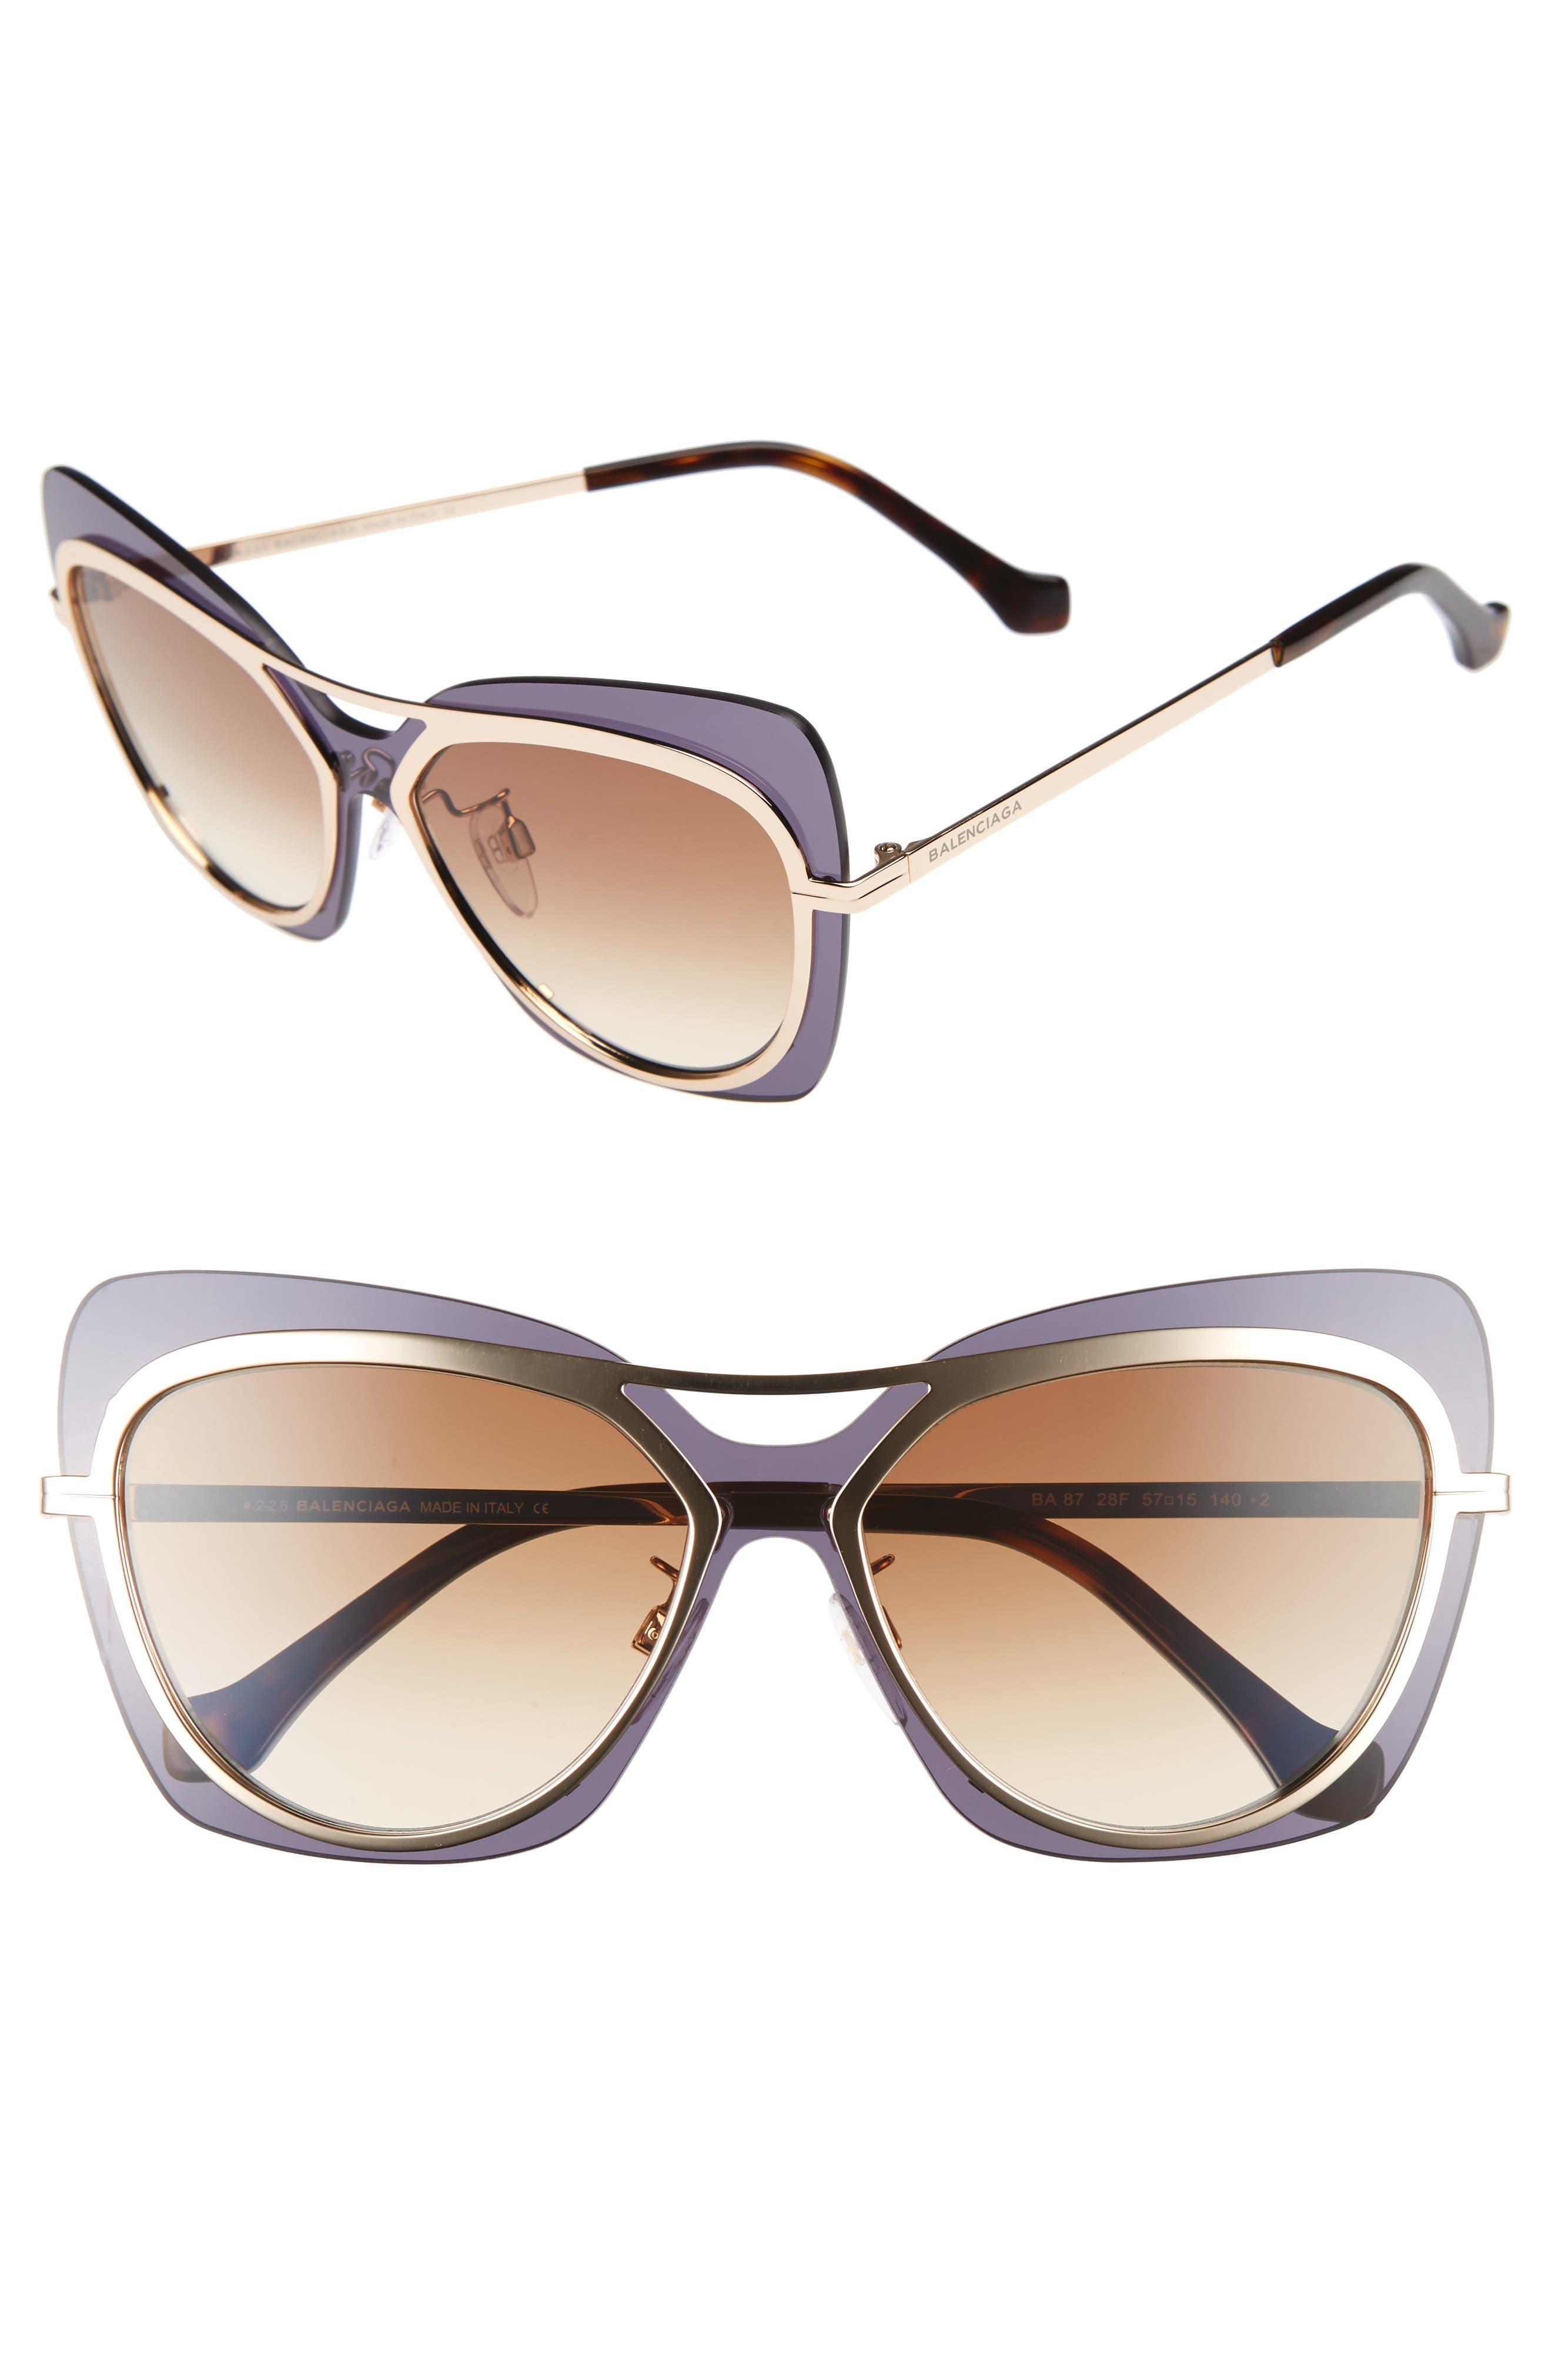 Main Image - Balenciaga 57mm Layered Butterfly Sunglasses